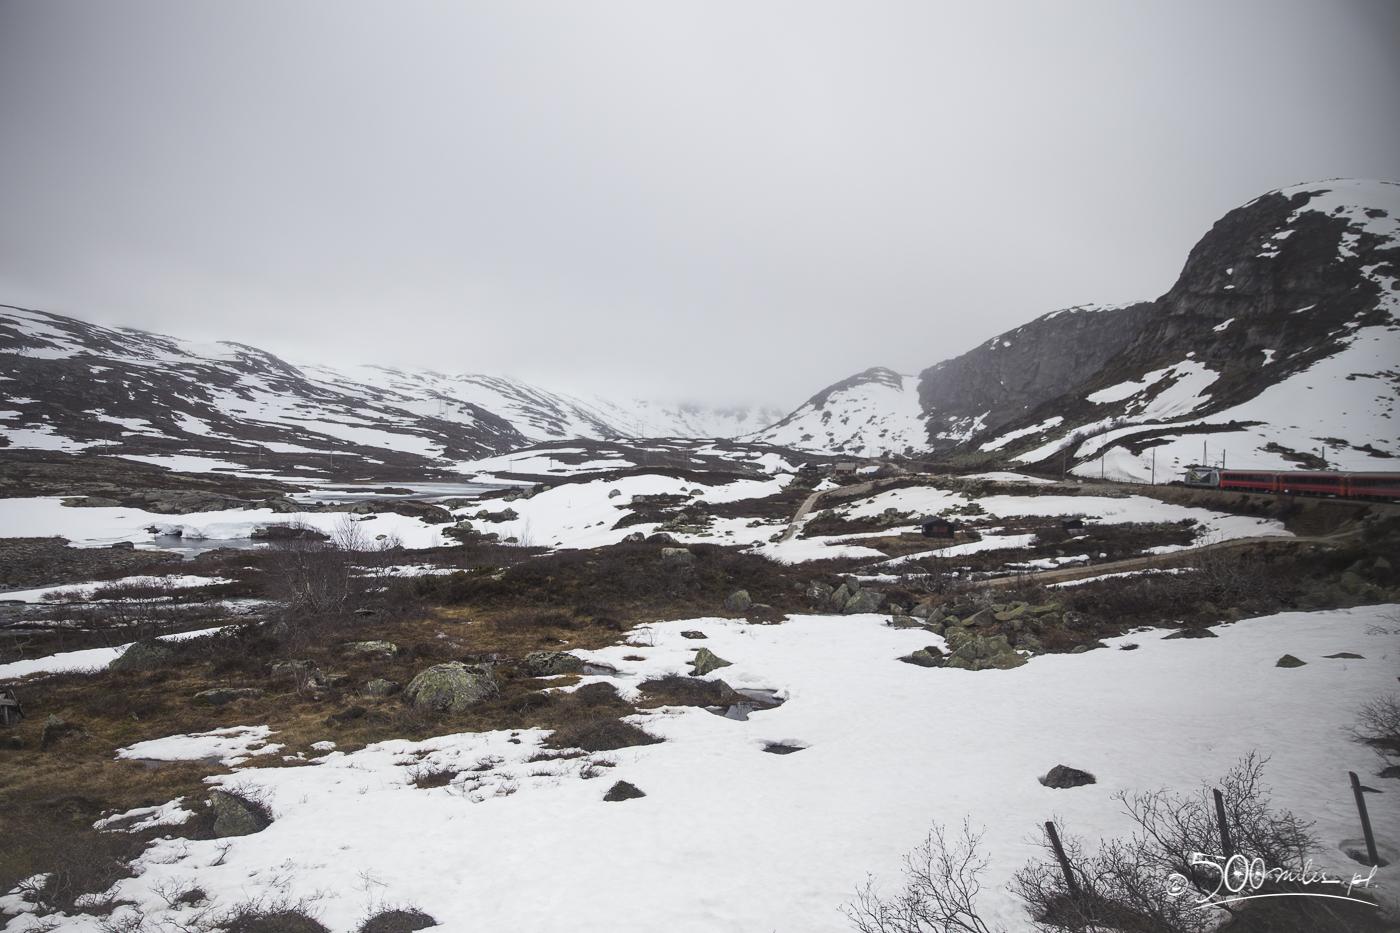 Oslo-Bergen train ride - going through snow